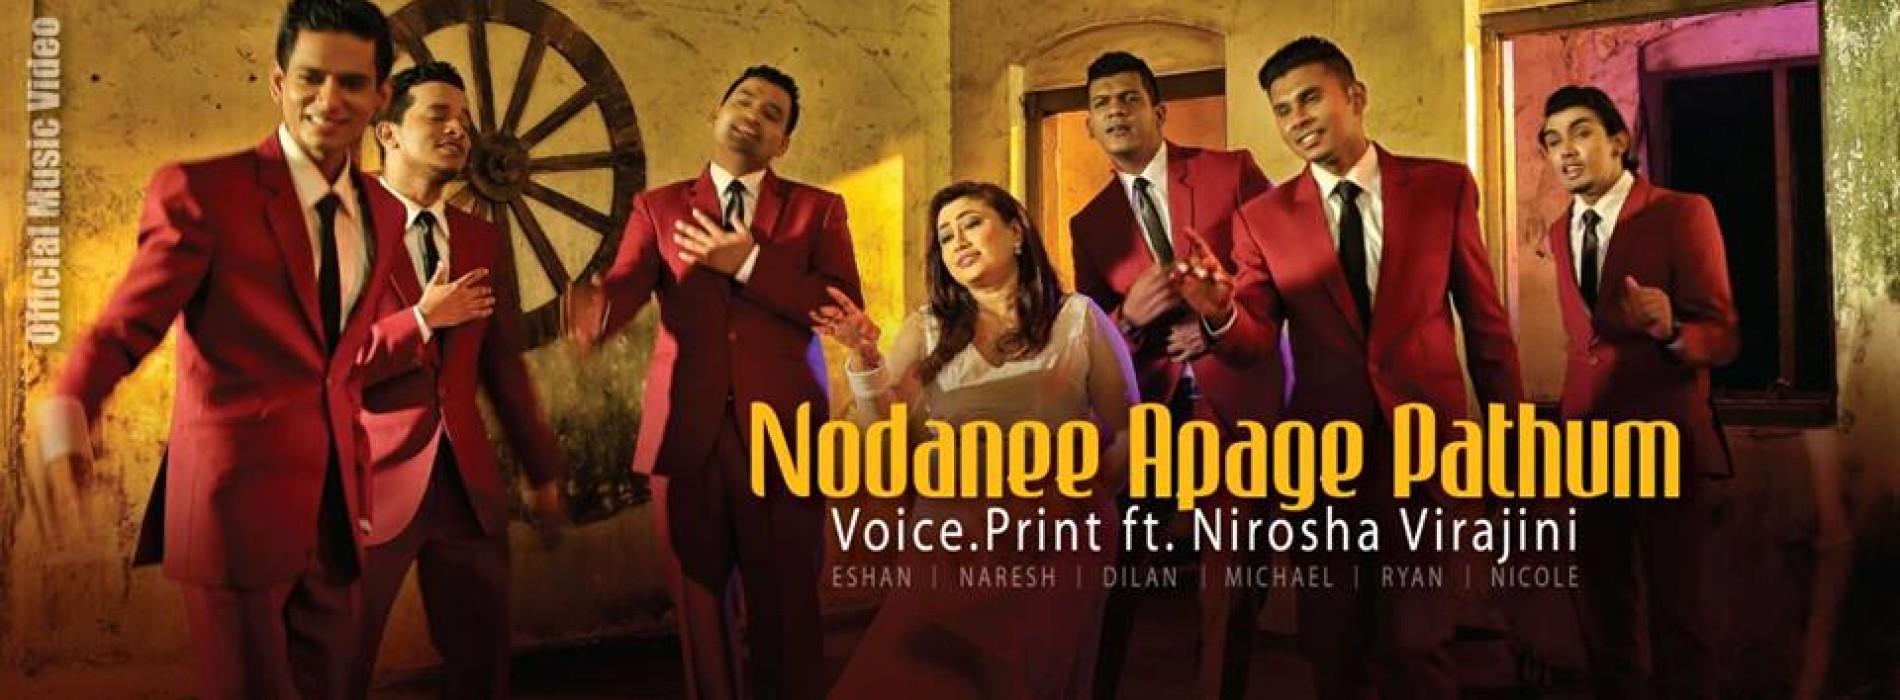 Voice.Print Ft Nirosha Virajini – Nodanee Apage Pathum